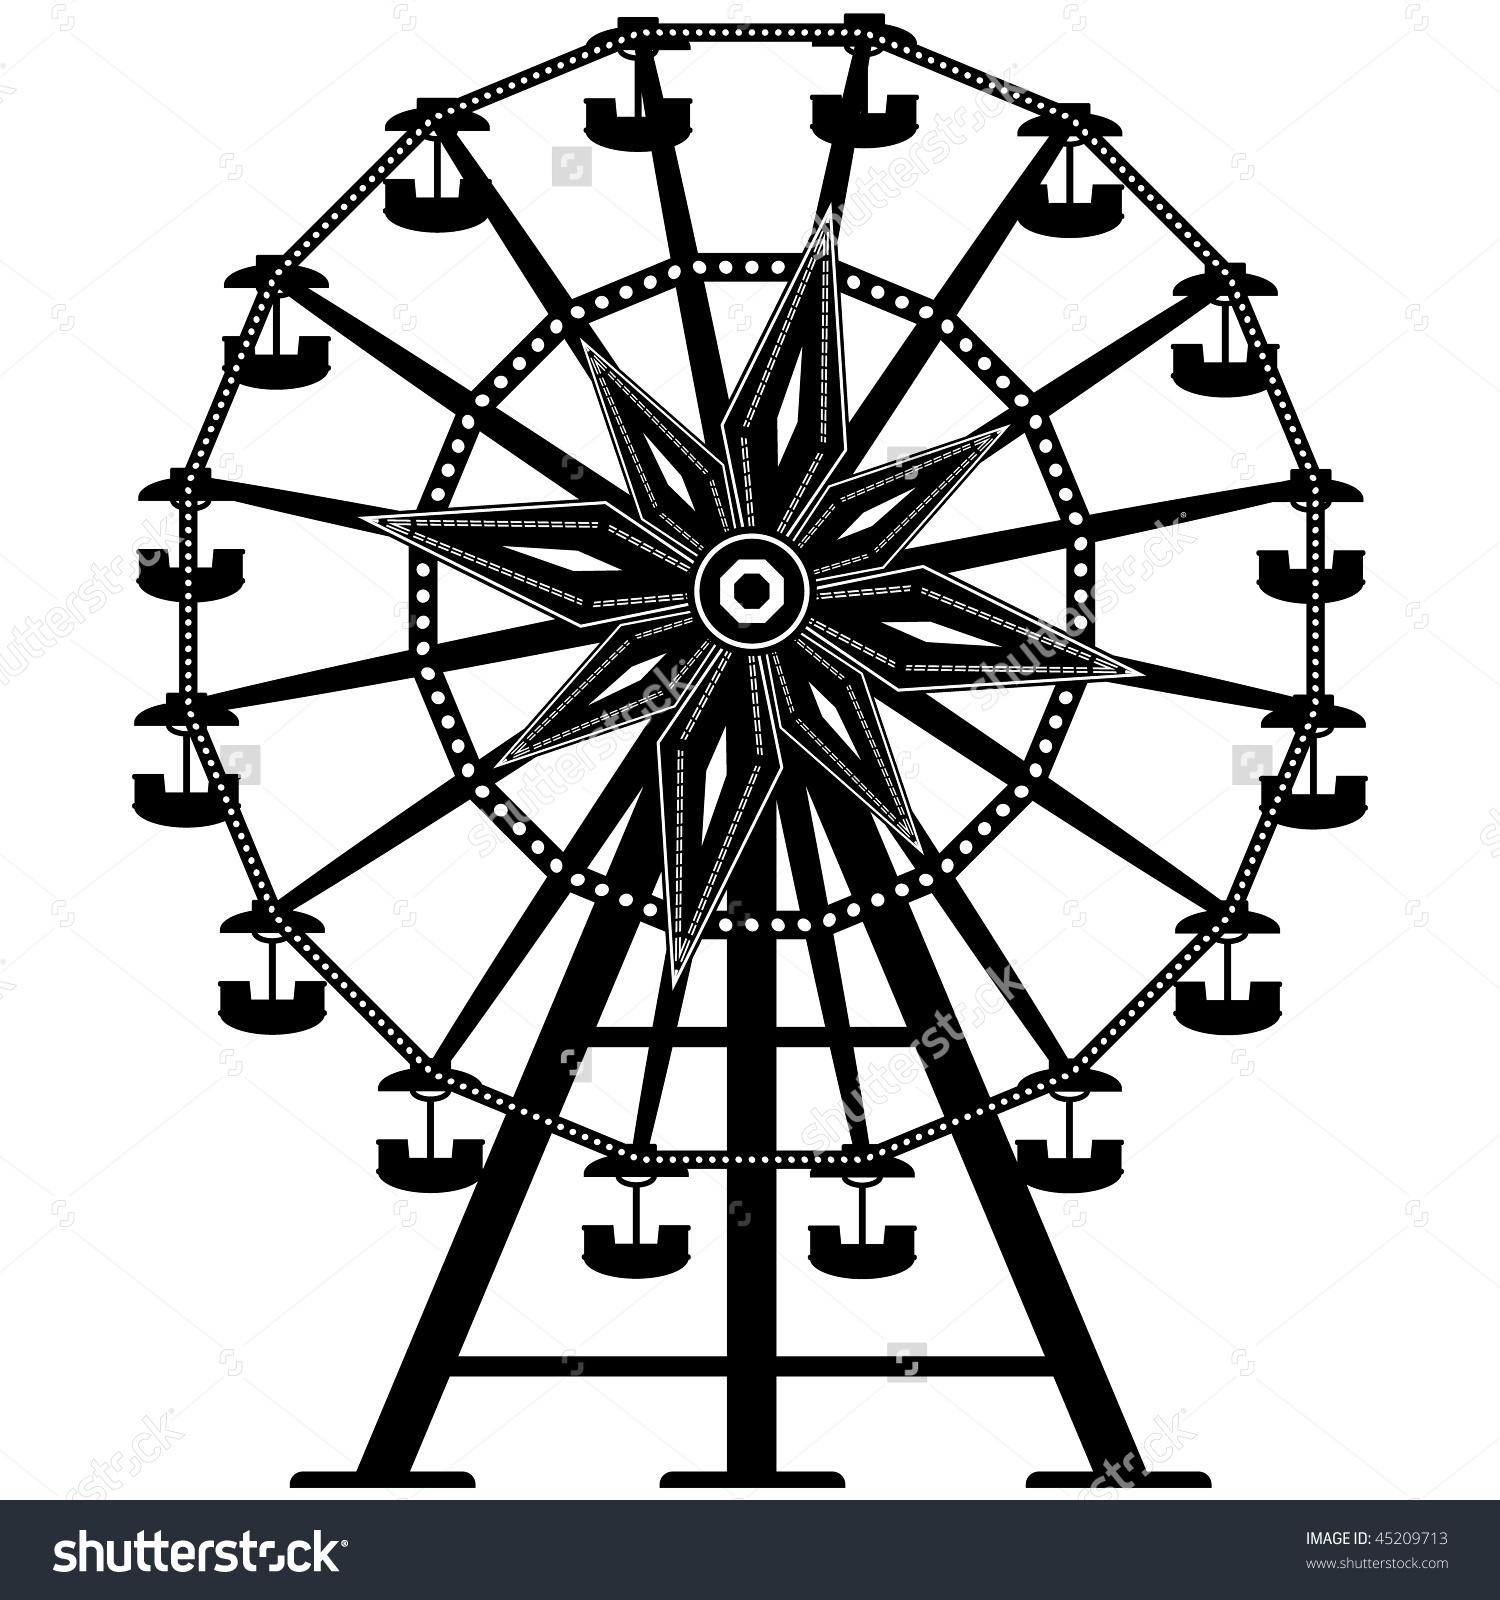 hight resolution of vintage ferris wheel clipart